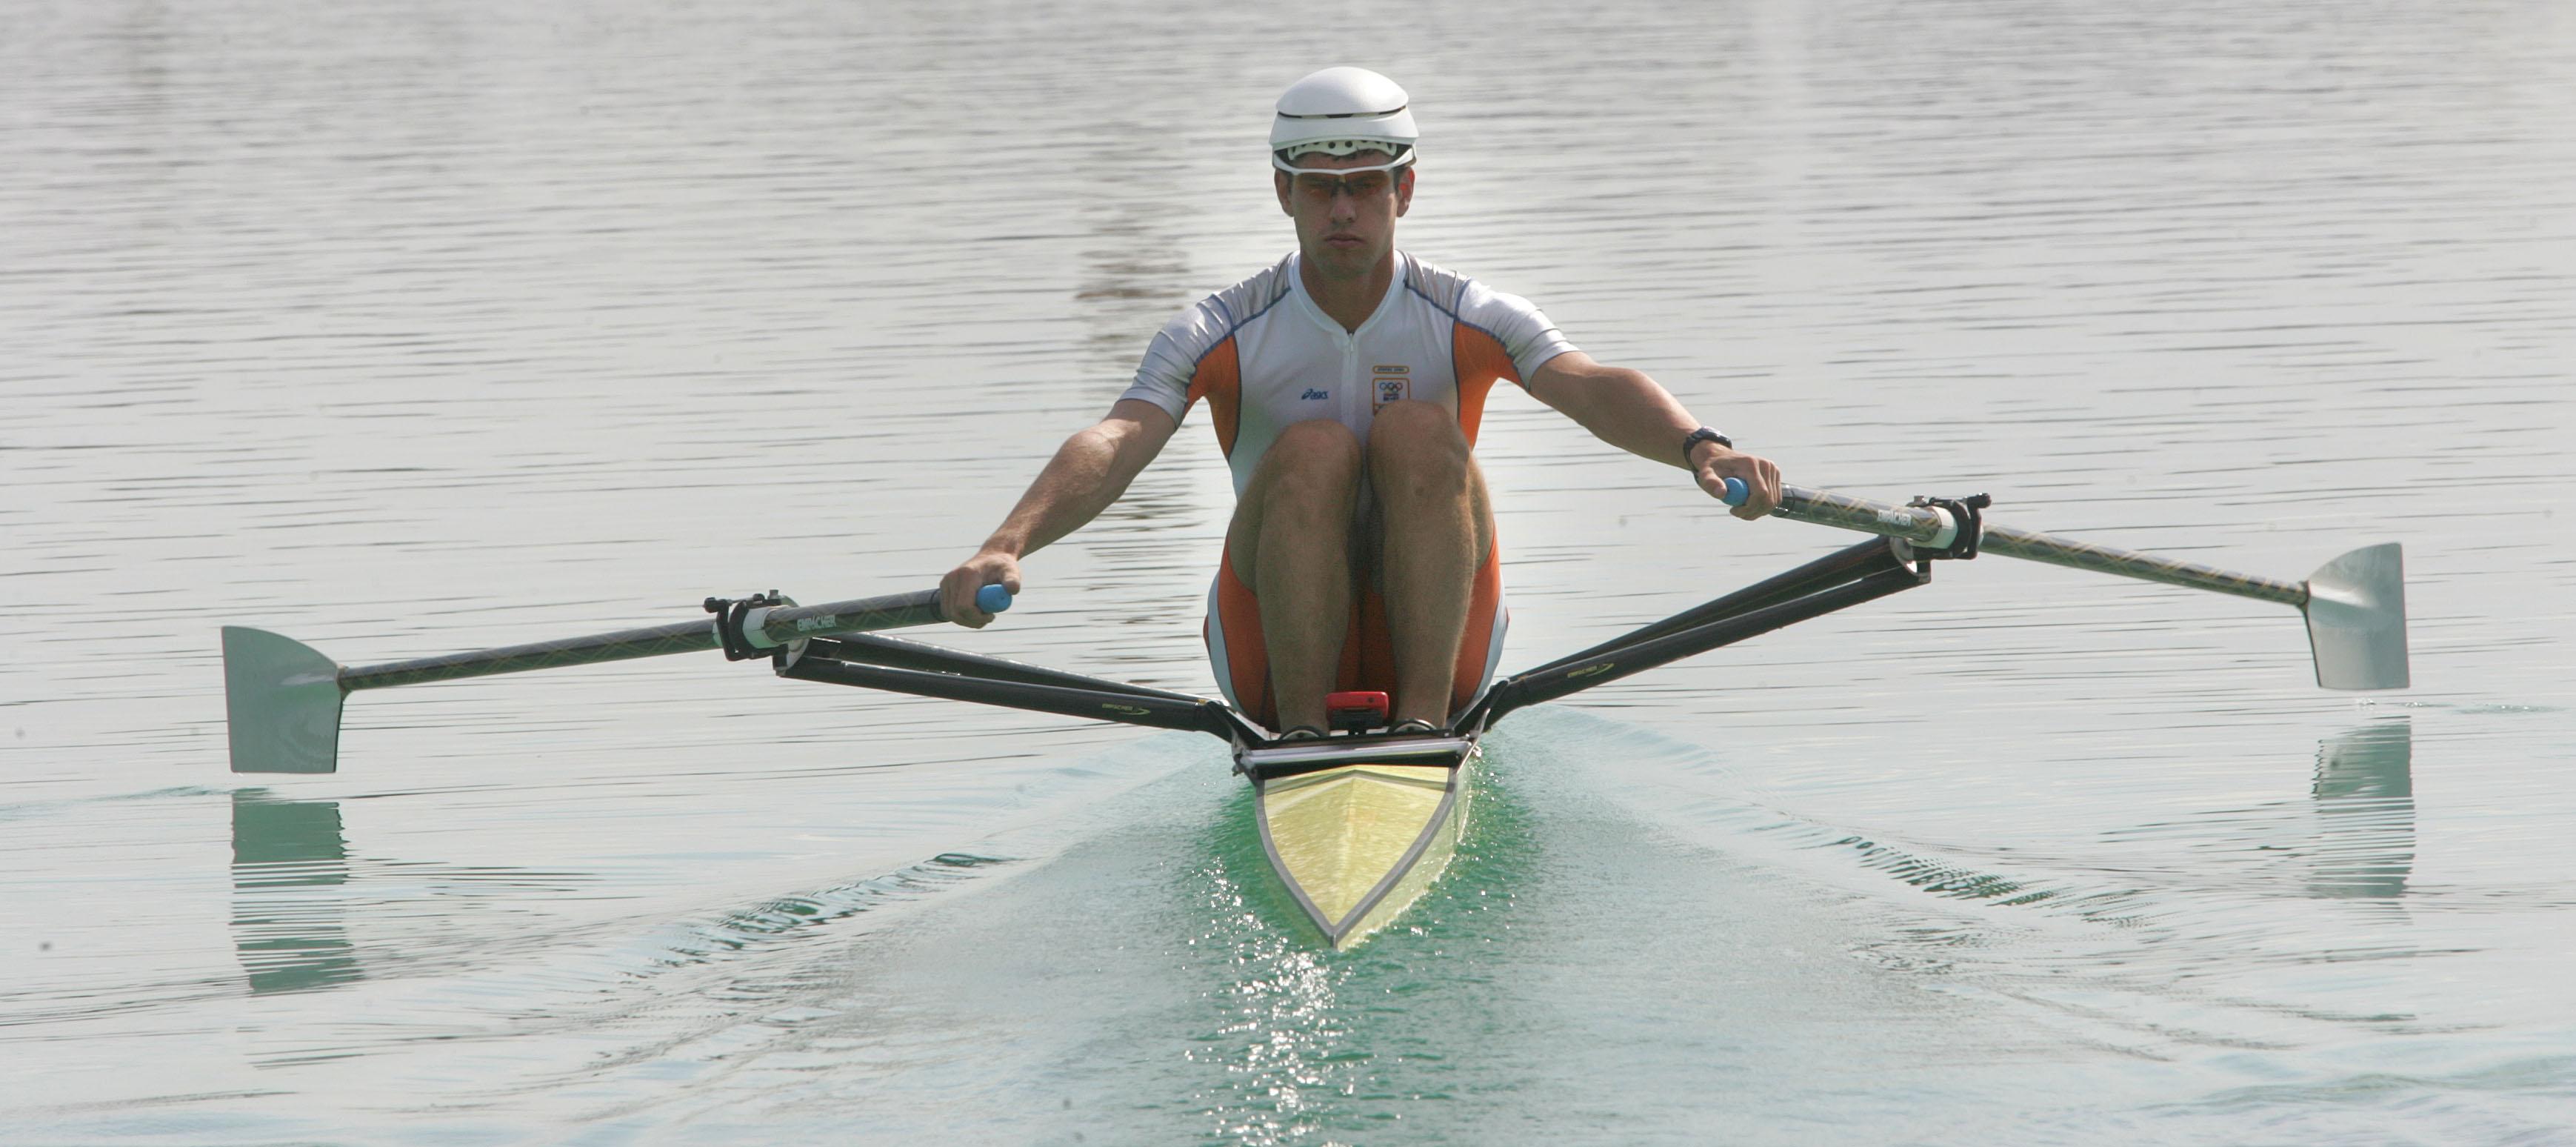 dsm_dirk_lippits_actionshot_rowing_1